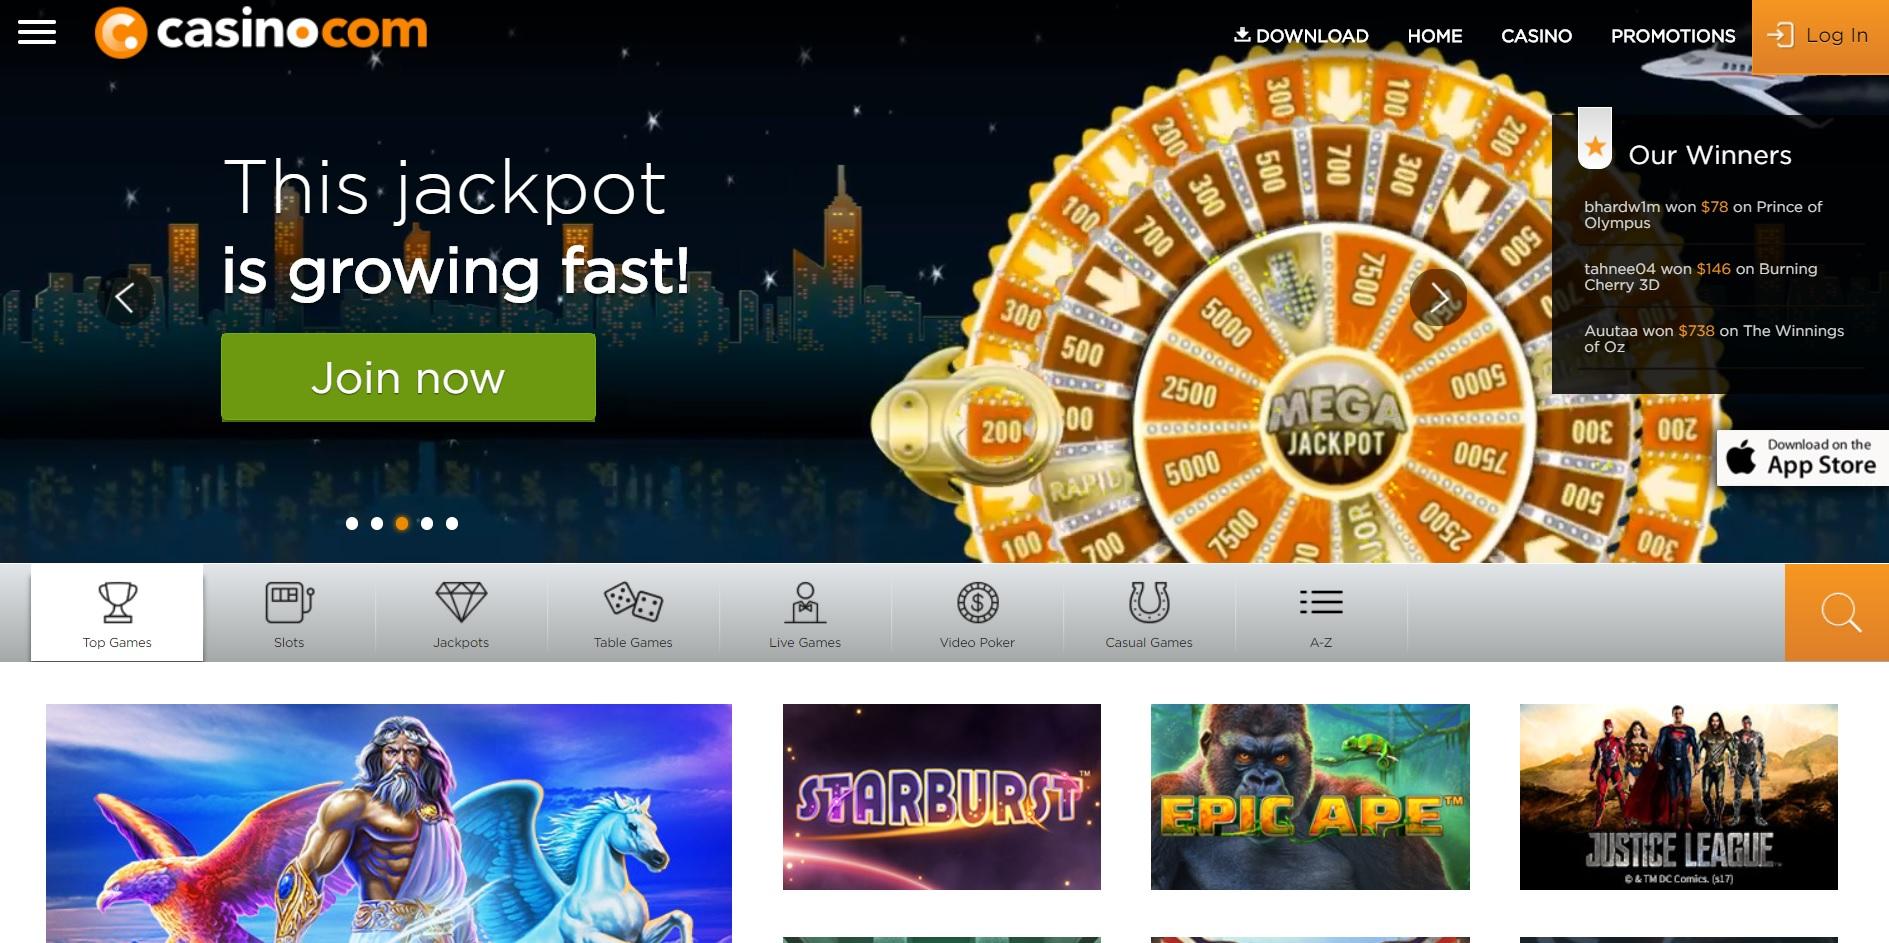 mighty slots mobile casino lobby